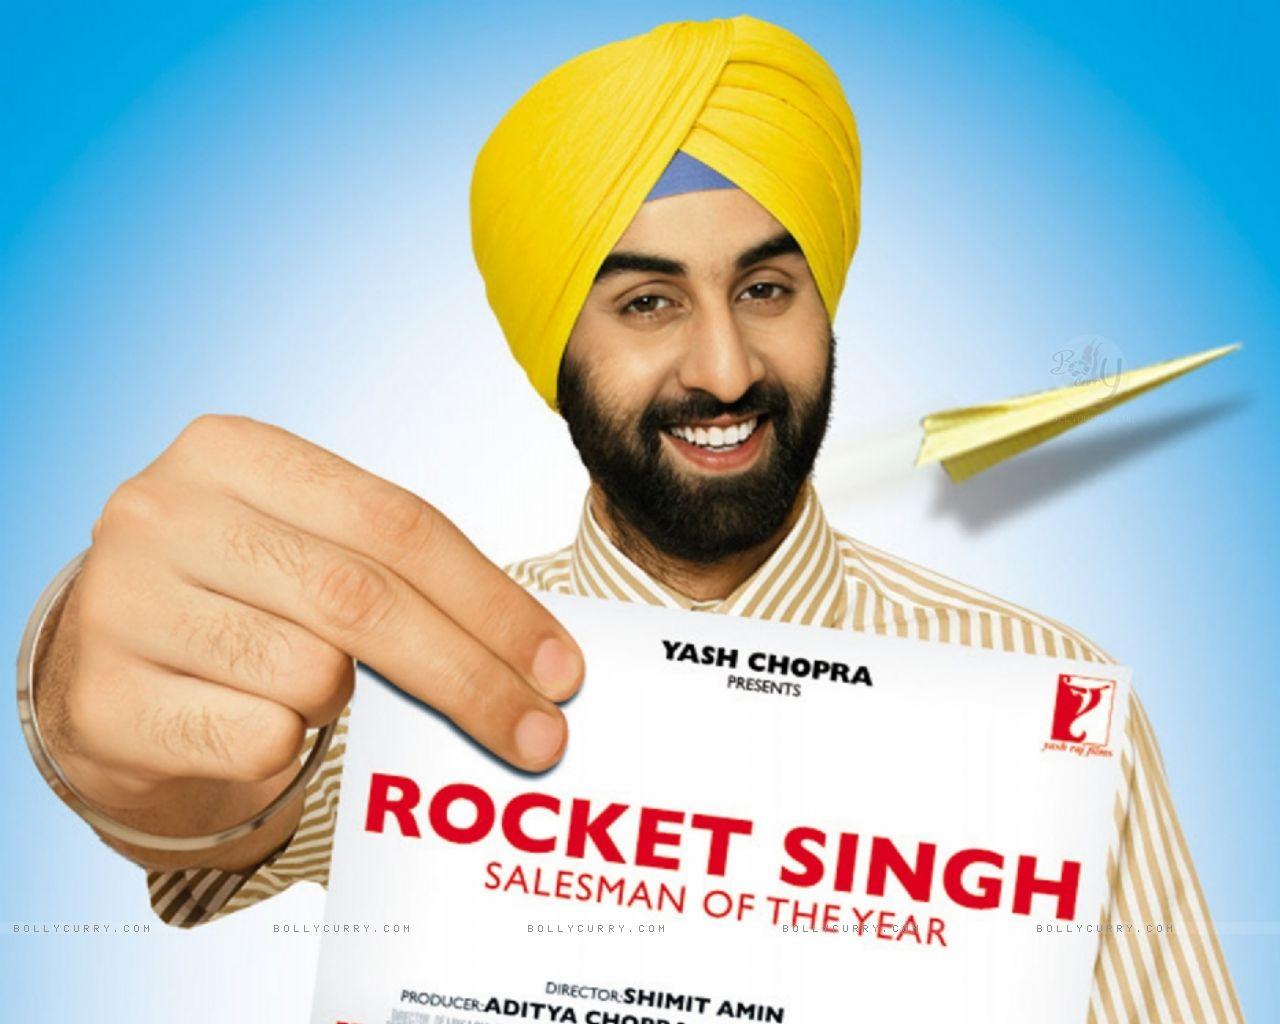 Rocket Singh Salesman of the Year،  - 5 أسرار في البيع ونصائح